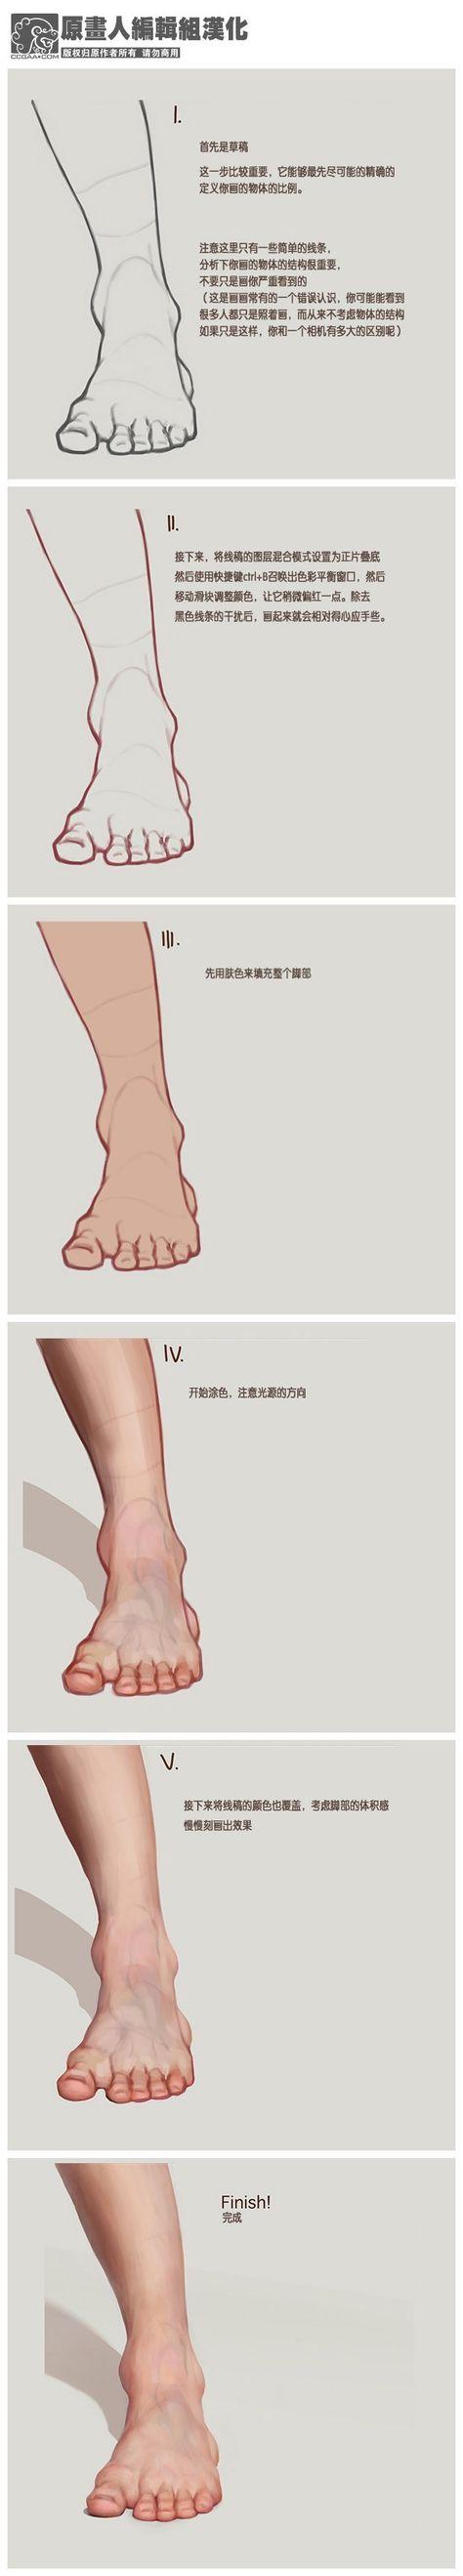 Feet Study 2 Steps by ~irysching on deviantART join us http ...